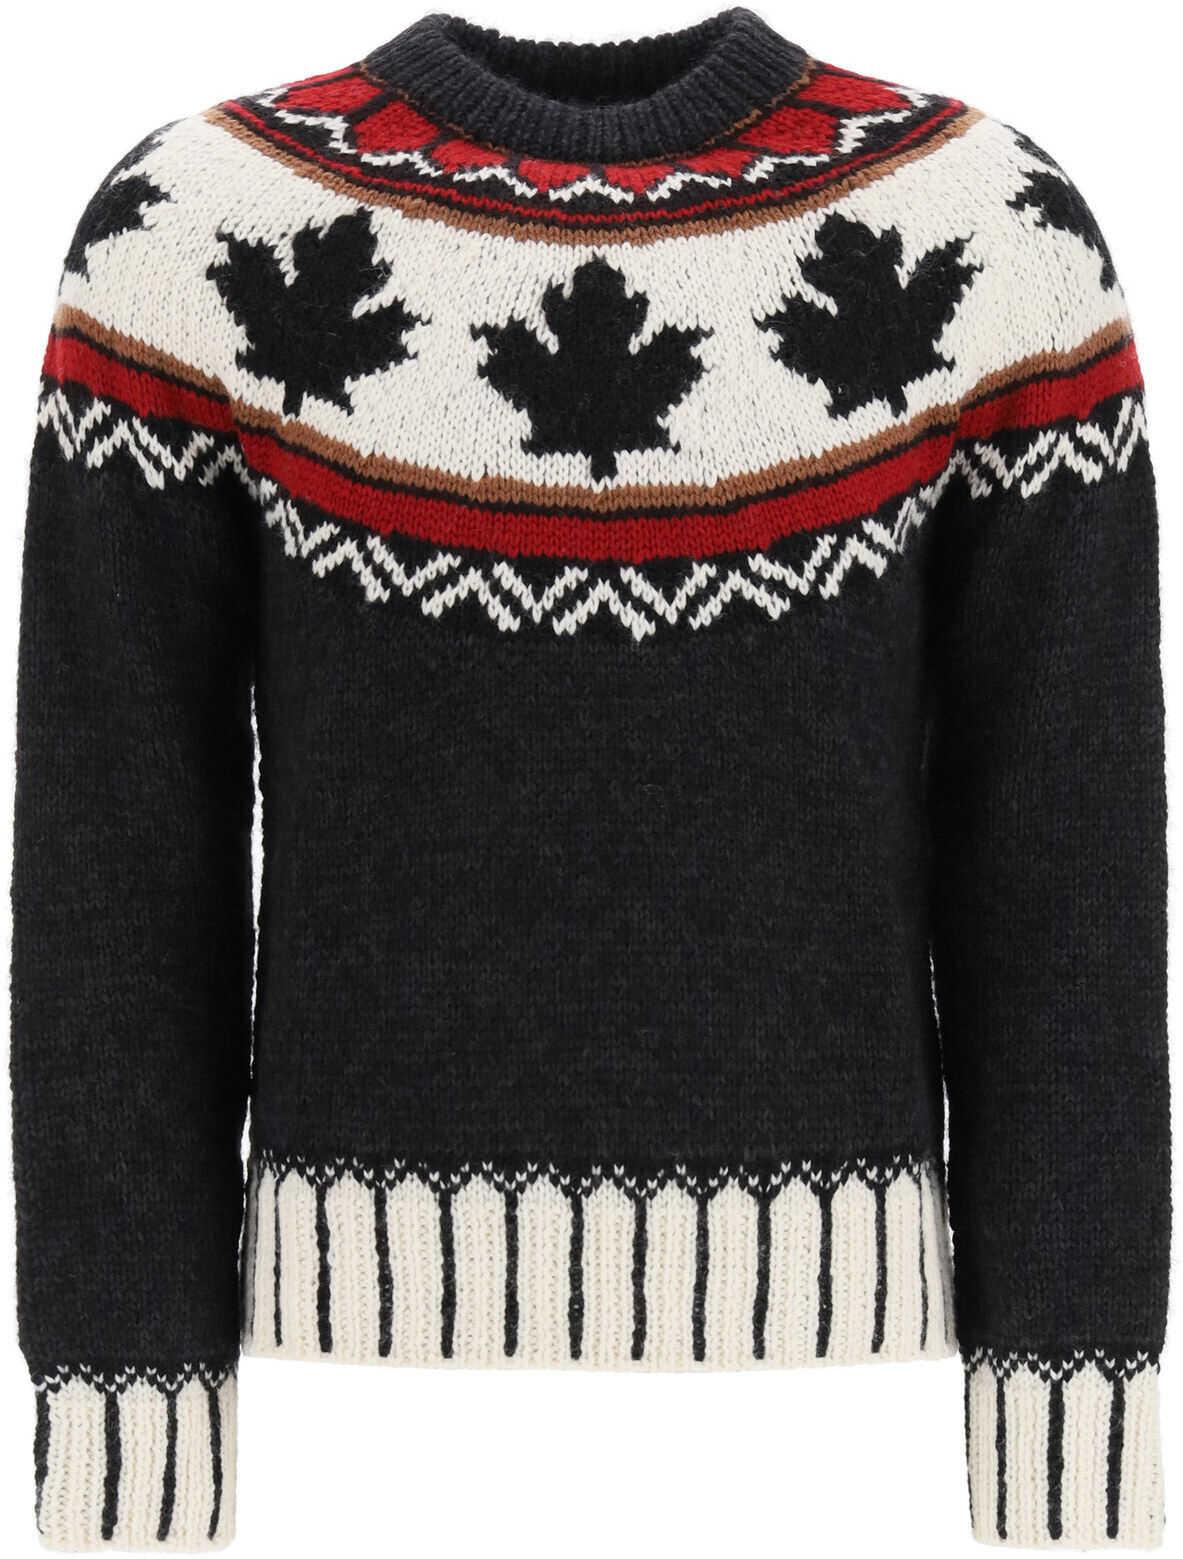 DSQUARED2 Fair Isle Intarsia Sweater GREY imagine